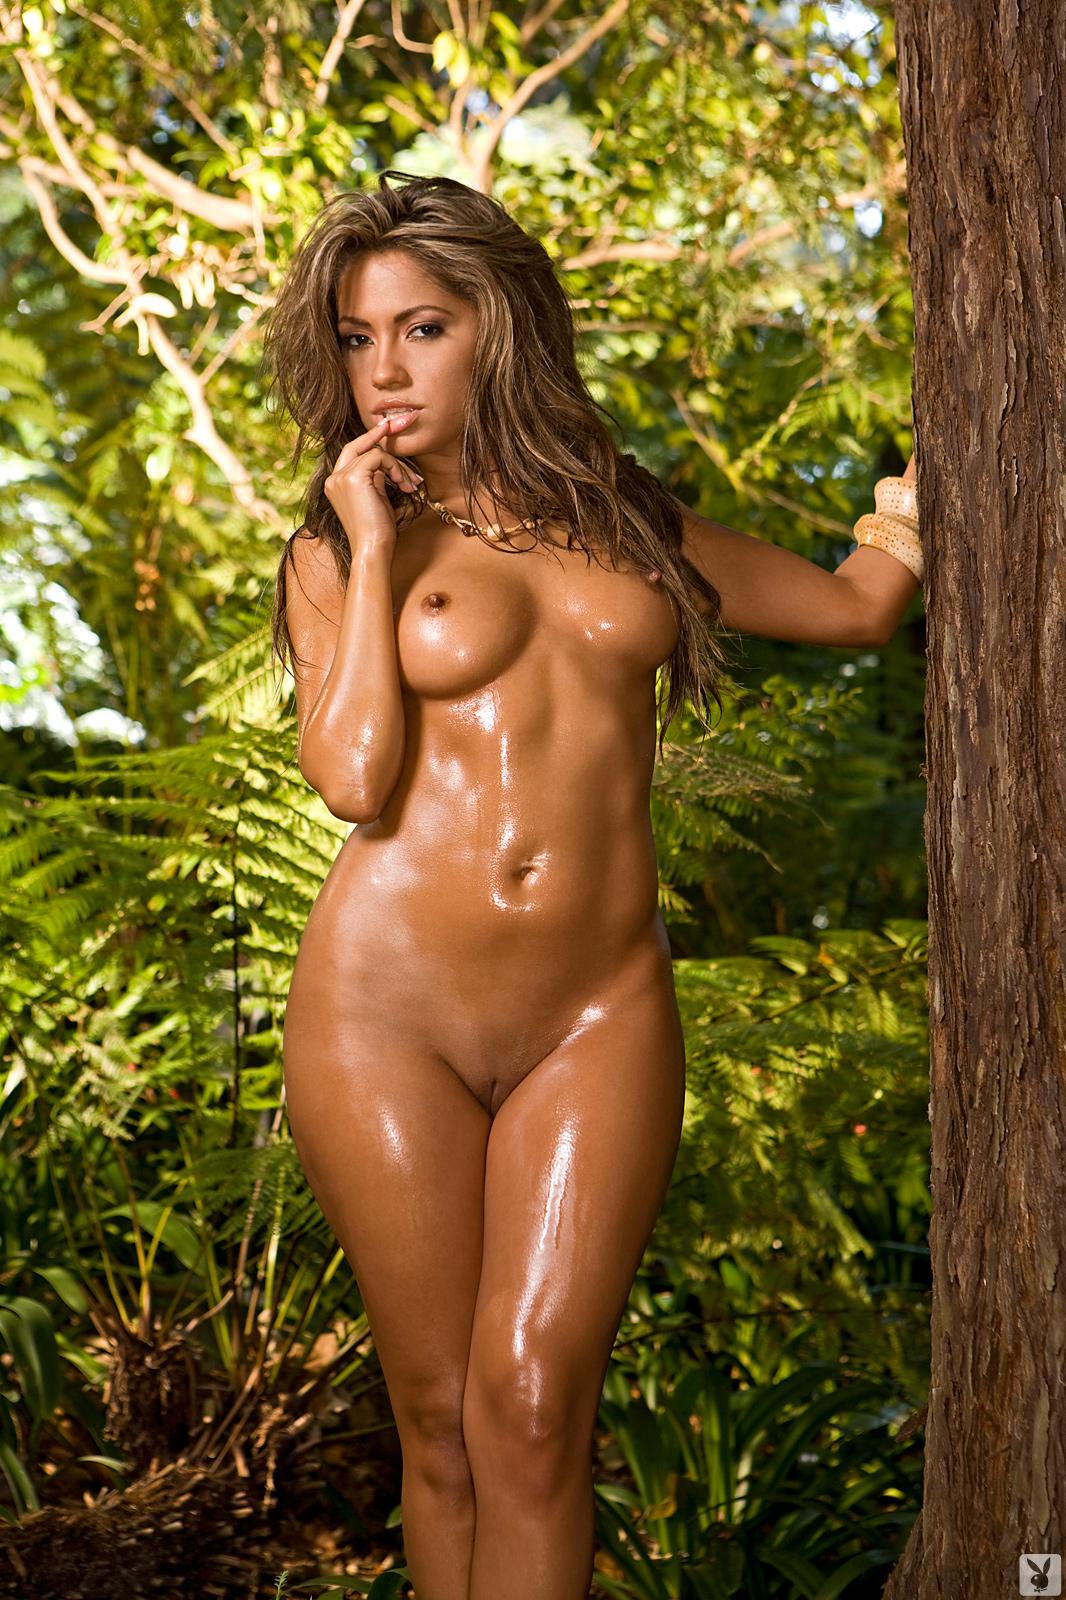 topless jungle girl photo